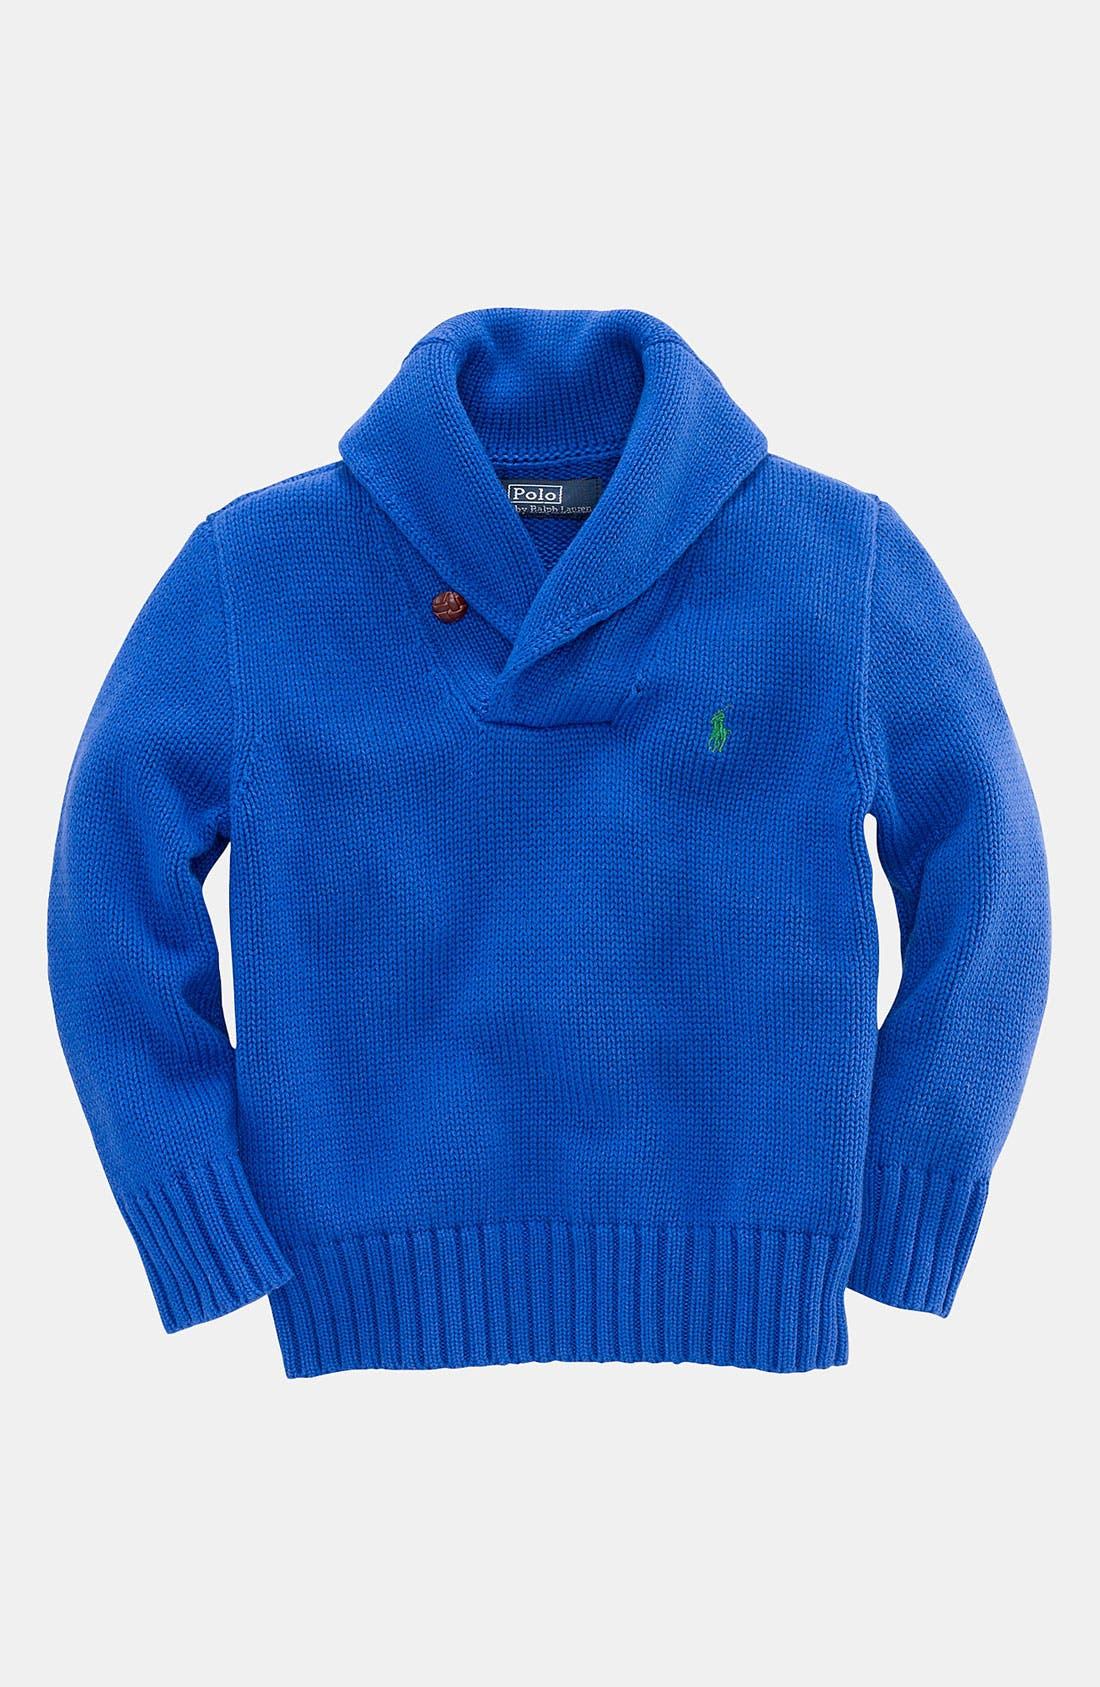 Alternate Image 1 Selected - Ralph Lauren Shawl Collar Sweater (Toddler)